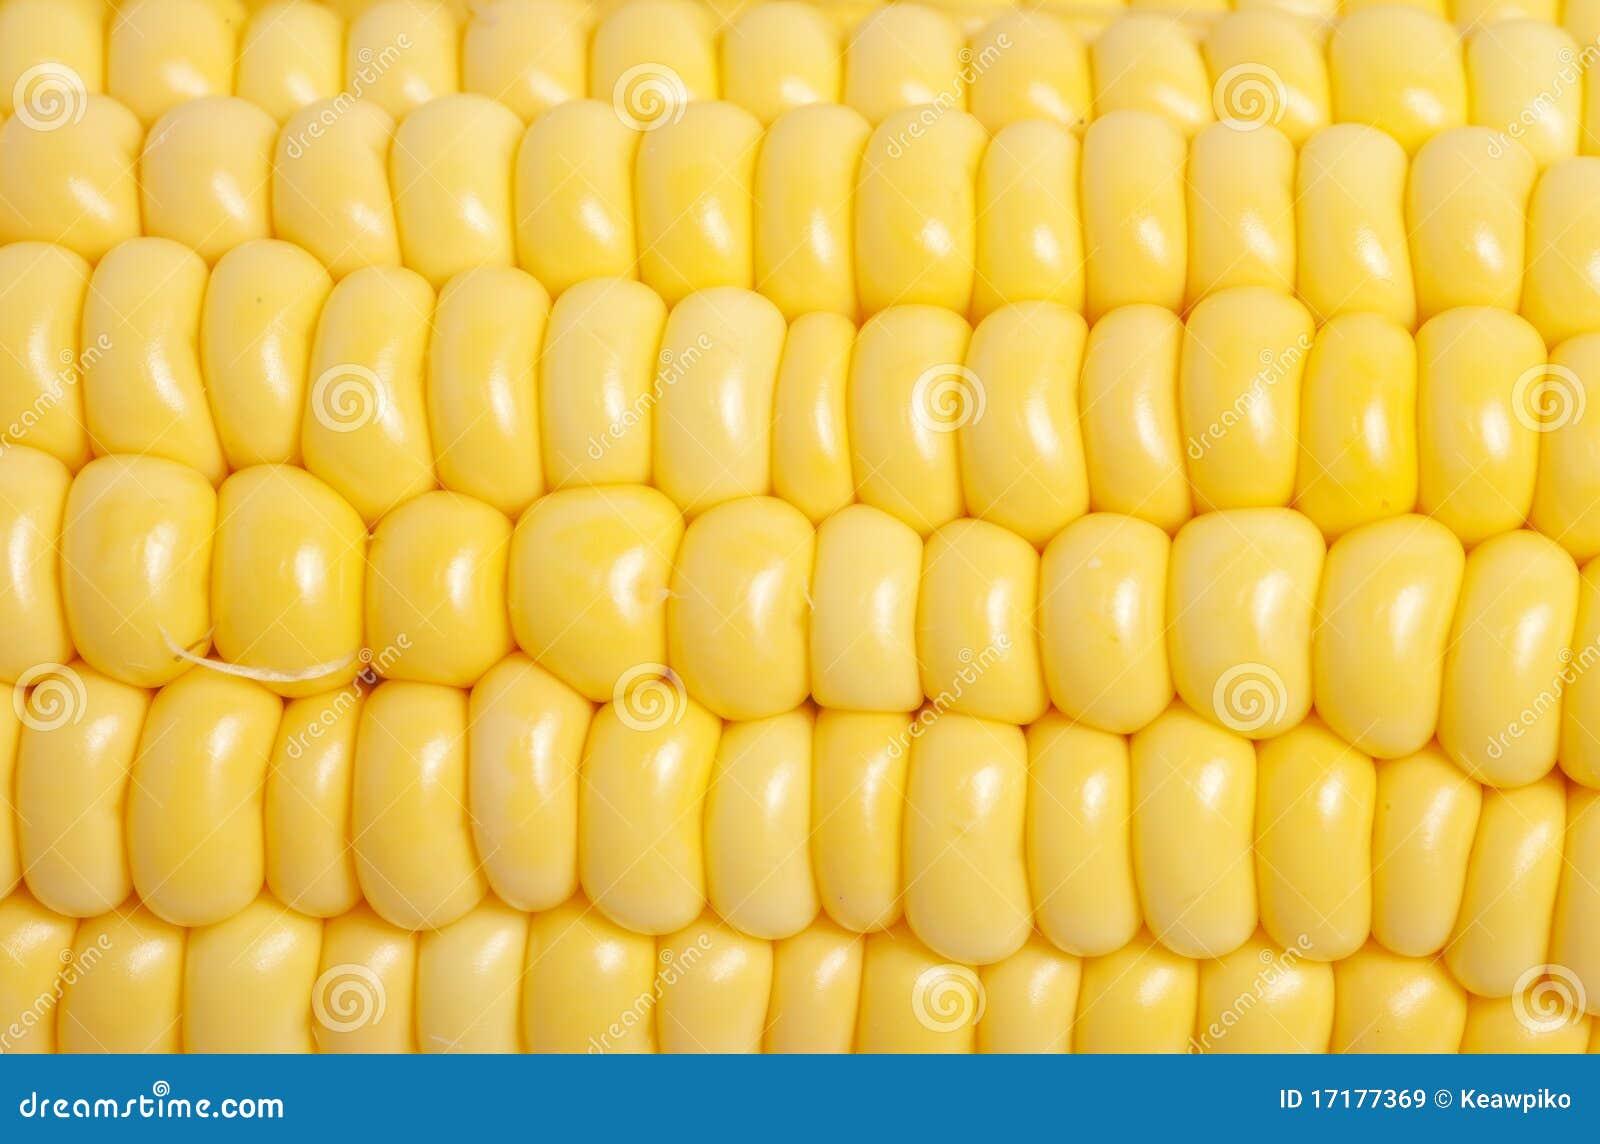 corn texture closeup royalty free stock images image ear of corn clip art images Corn Plant Clip Art